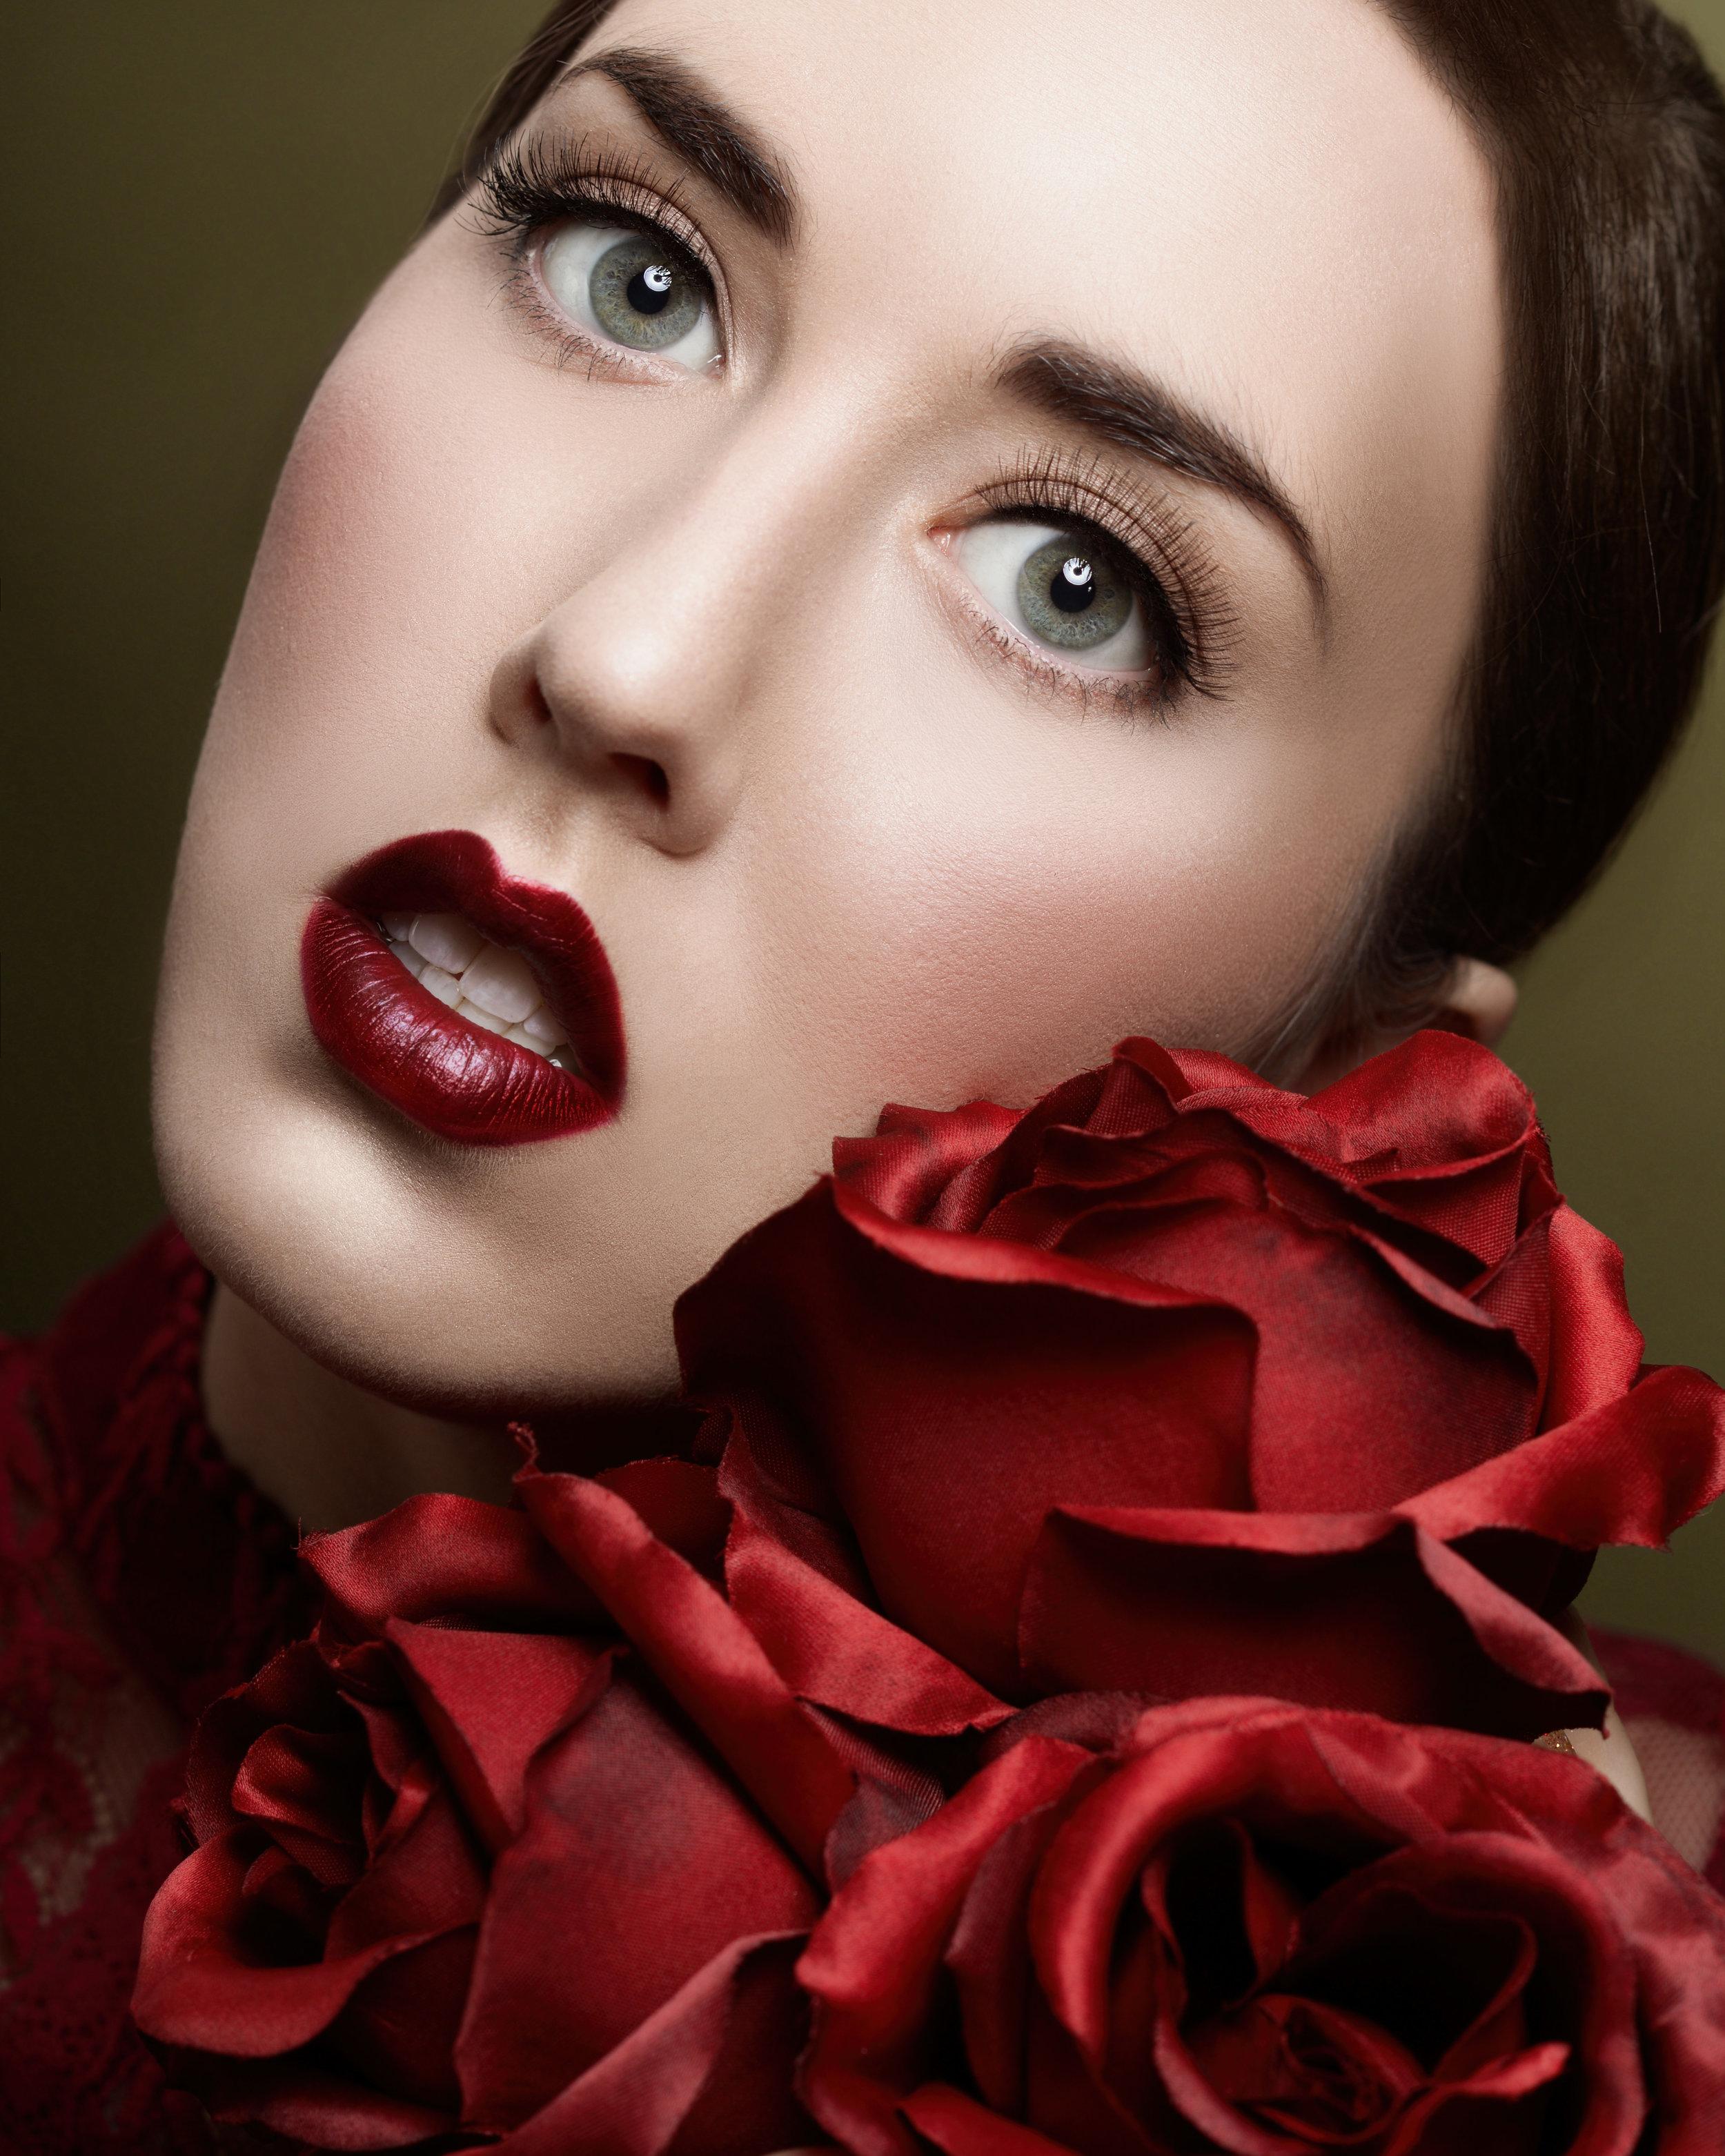 Anthem in Art Houston Texas Beauty Model Photography 3